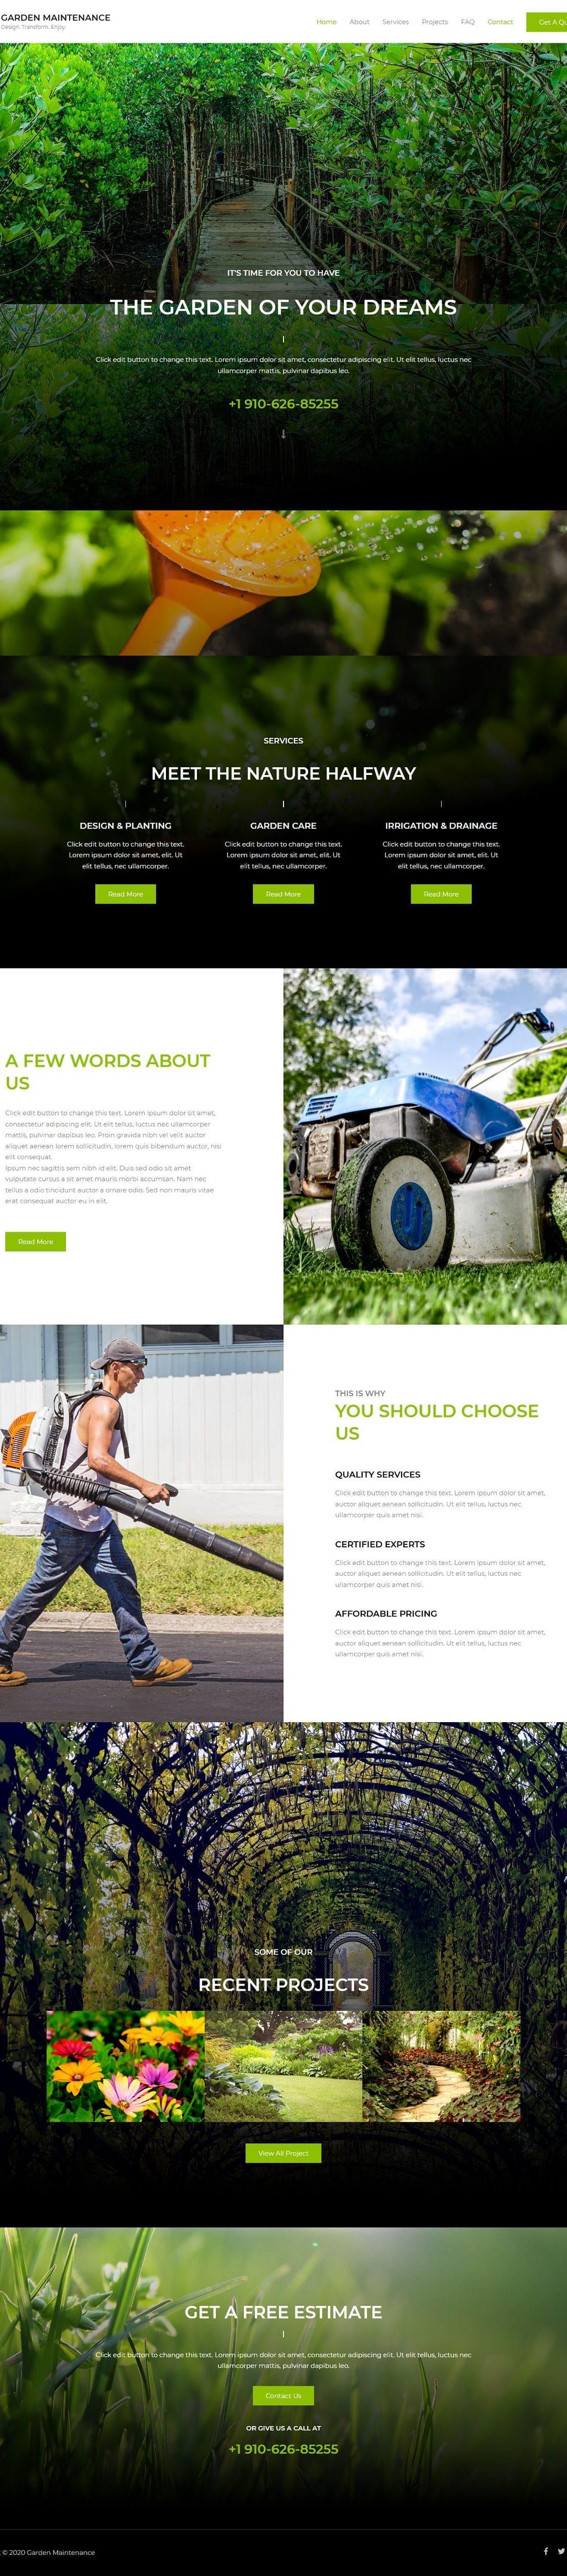 Garden Maintenance - Home Page 1280 x 4996